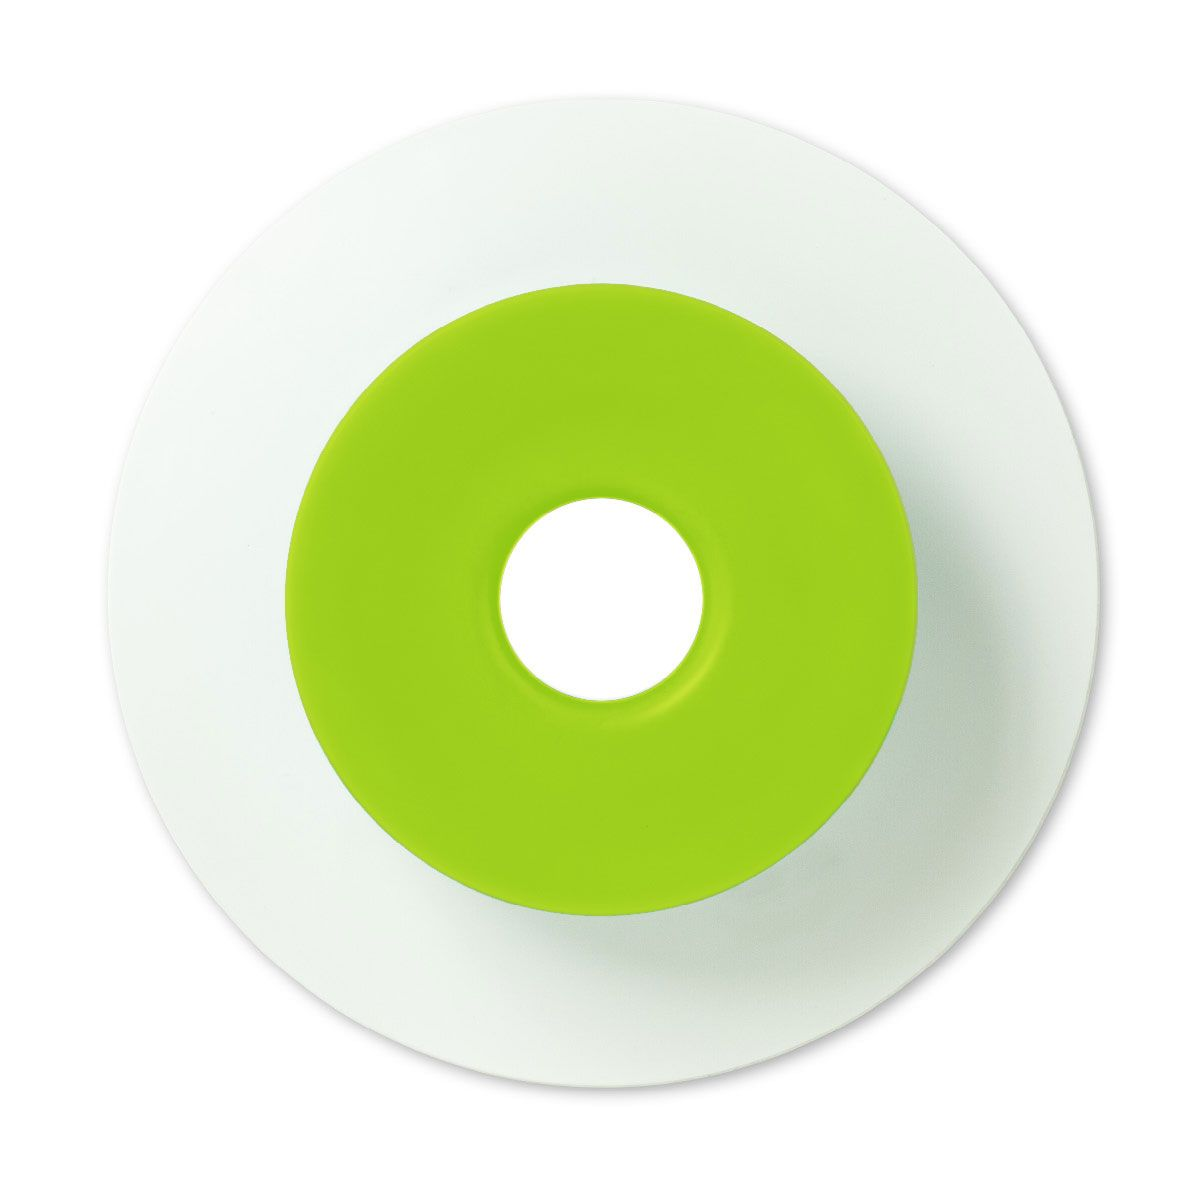 EUBIO/2Life PLA Spool Pair: Recycled Filaments